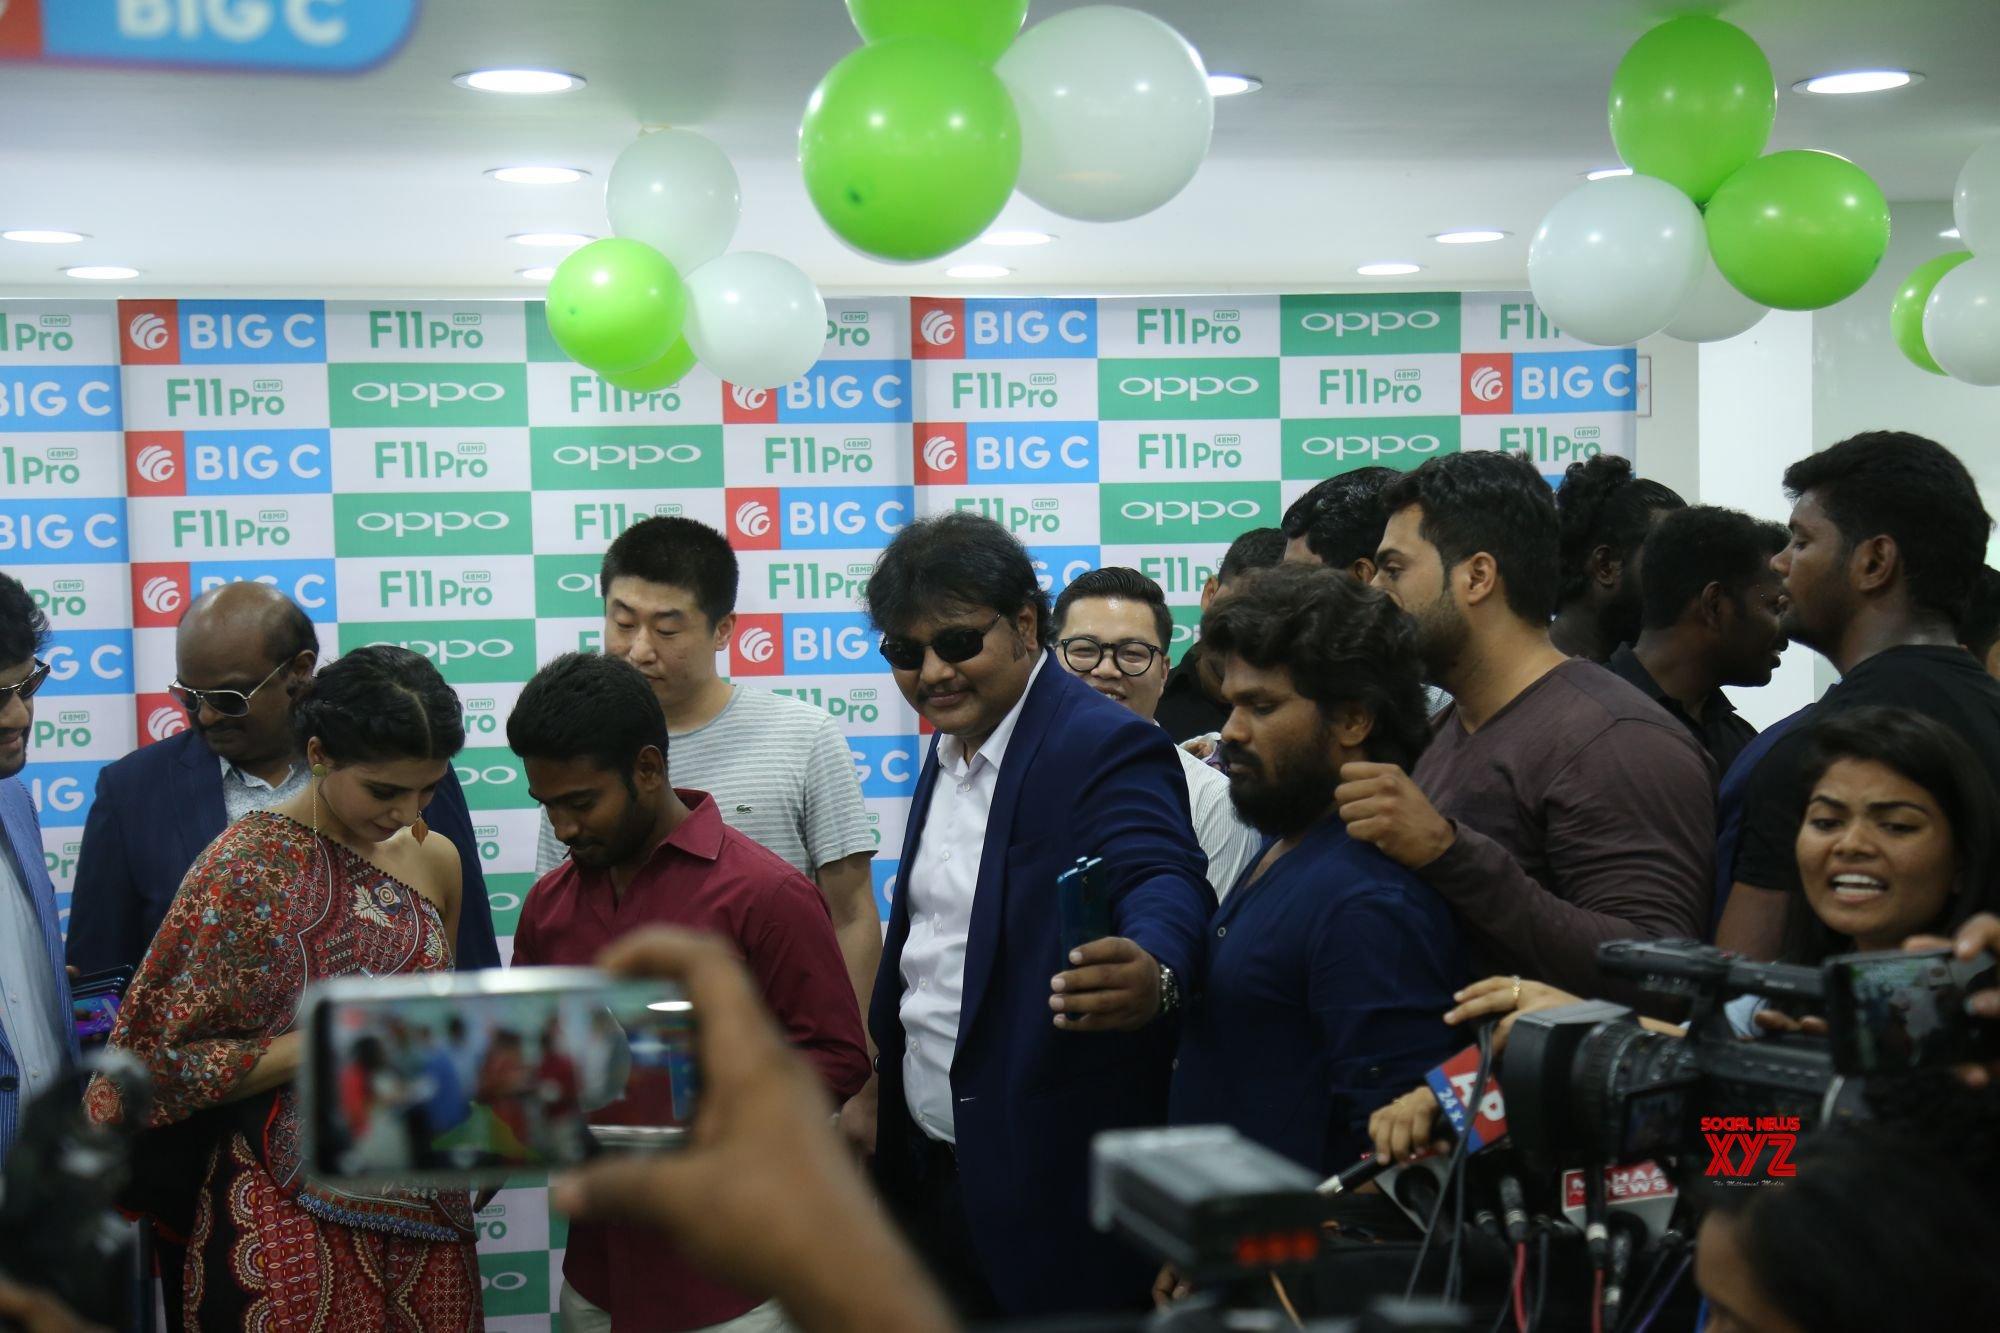 Samantha Launches Oppo F11 Pro At Big C Mobiles Vijayawada Gallery Set 2